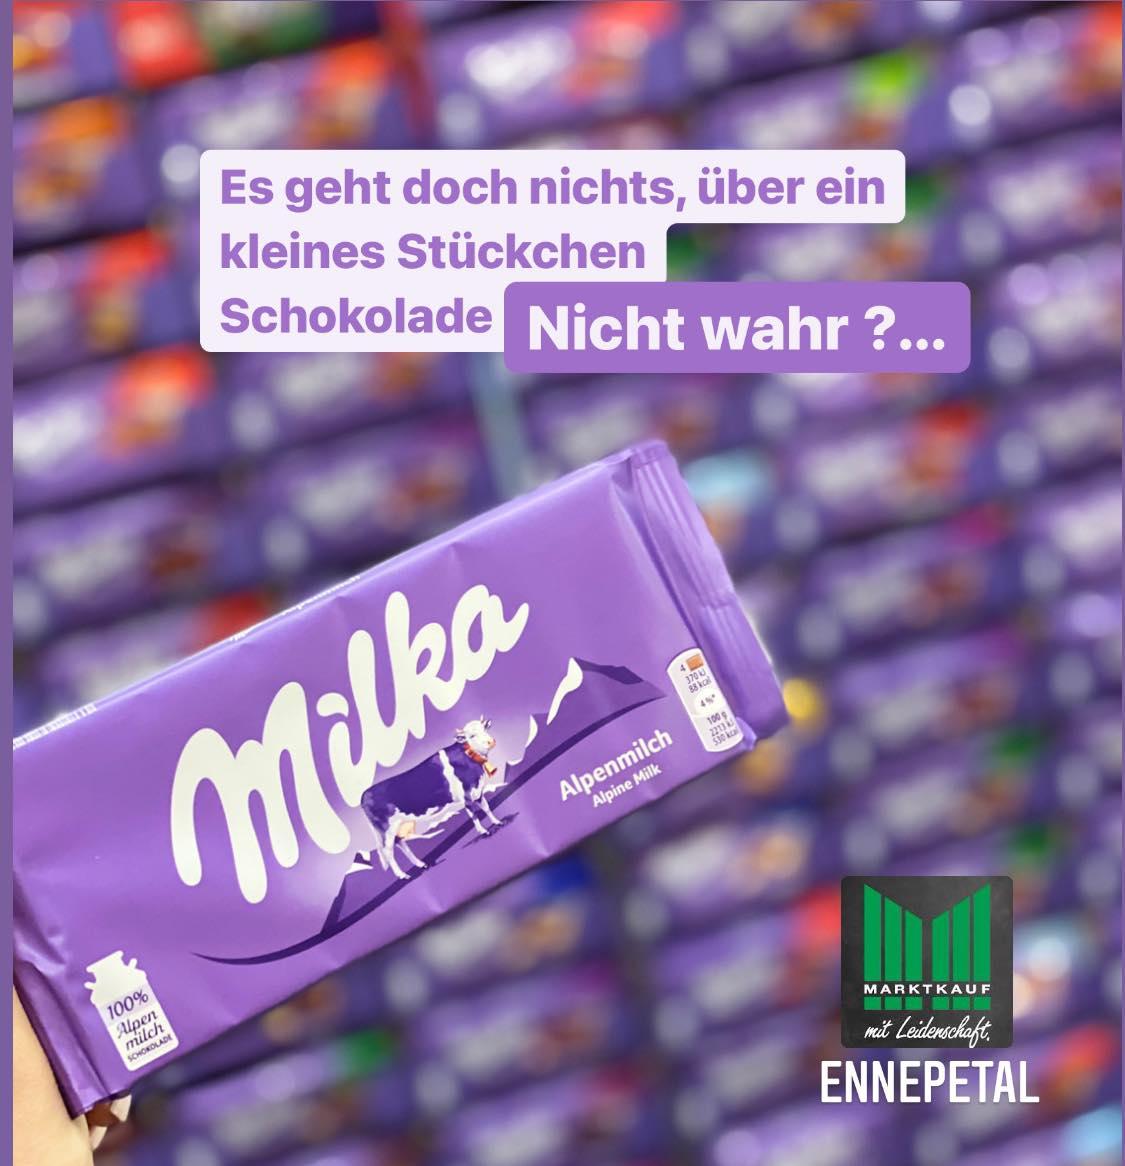 [LOKAL MARKTKAUF ENNEPETAL] Milka - Jede Tafel 0,59€